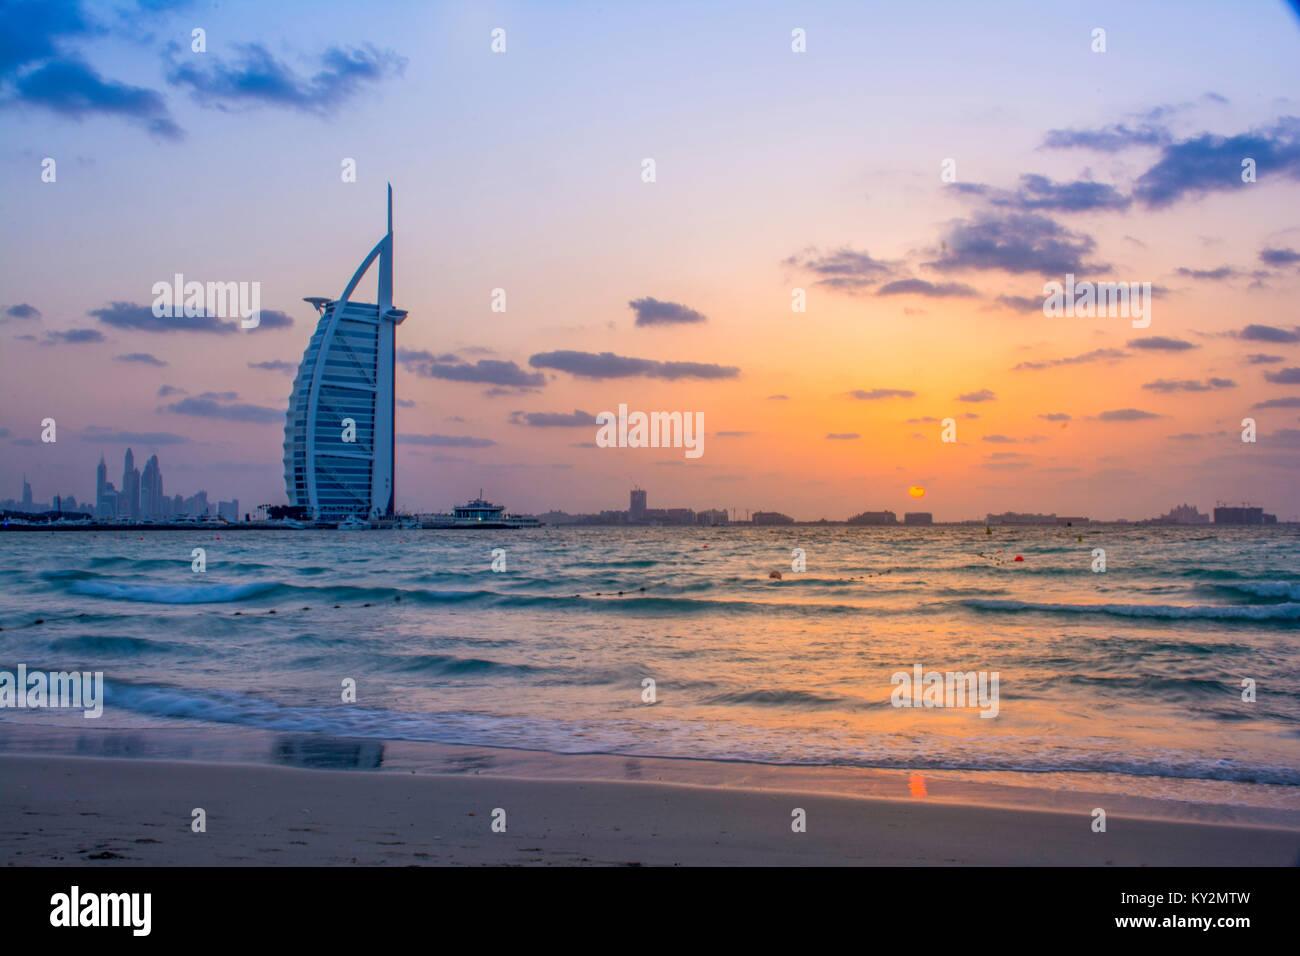 Burj Al Arab Sunset - Evening Shot from Umm Suqeim beach - Dubai - Stock Image